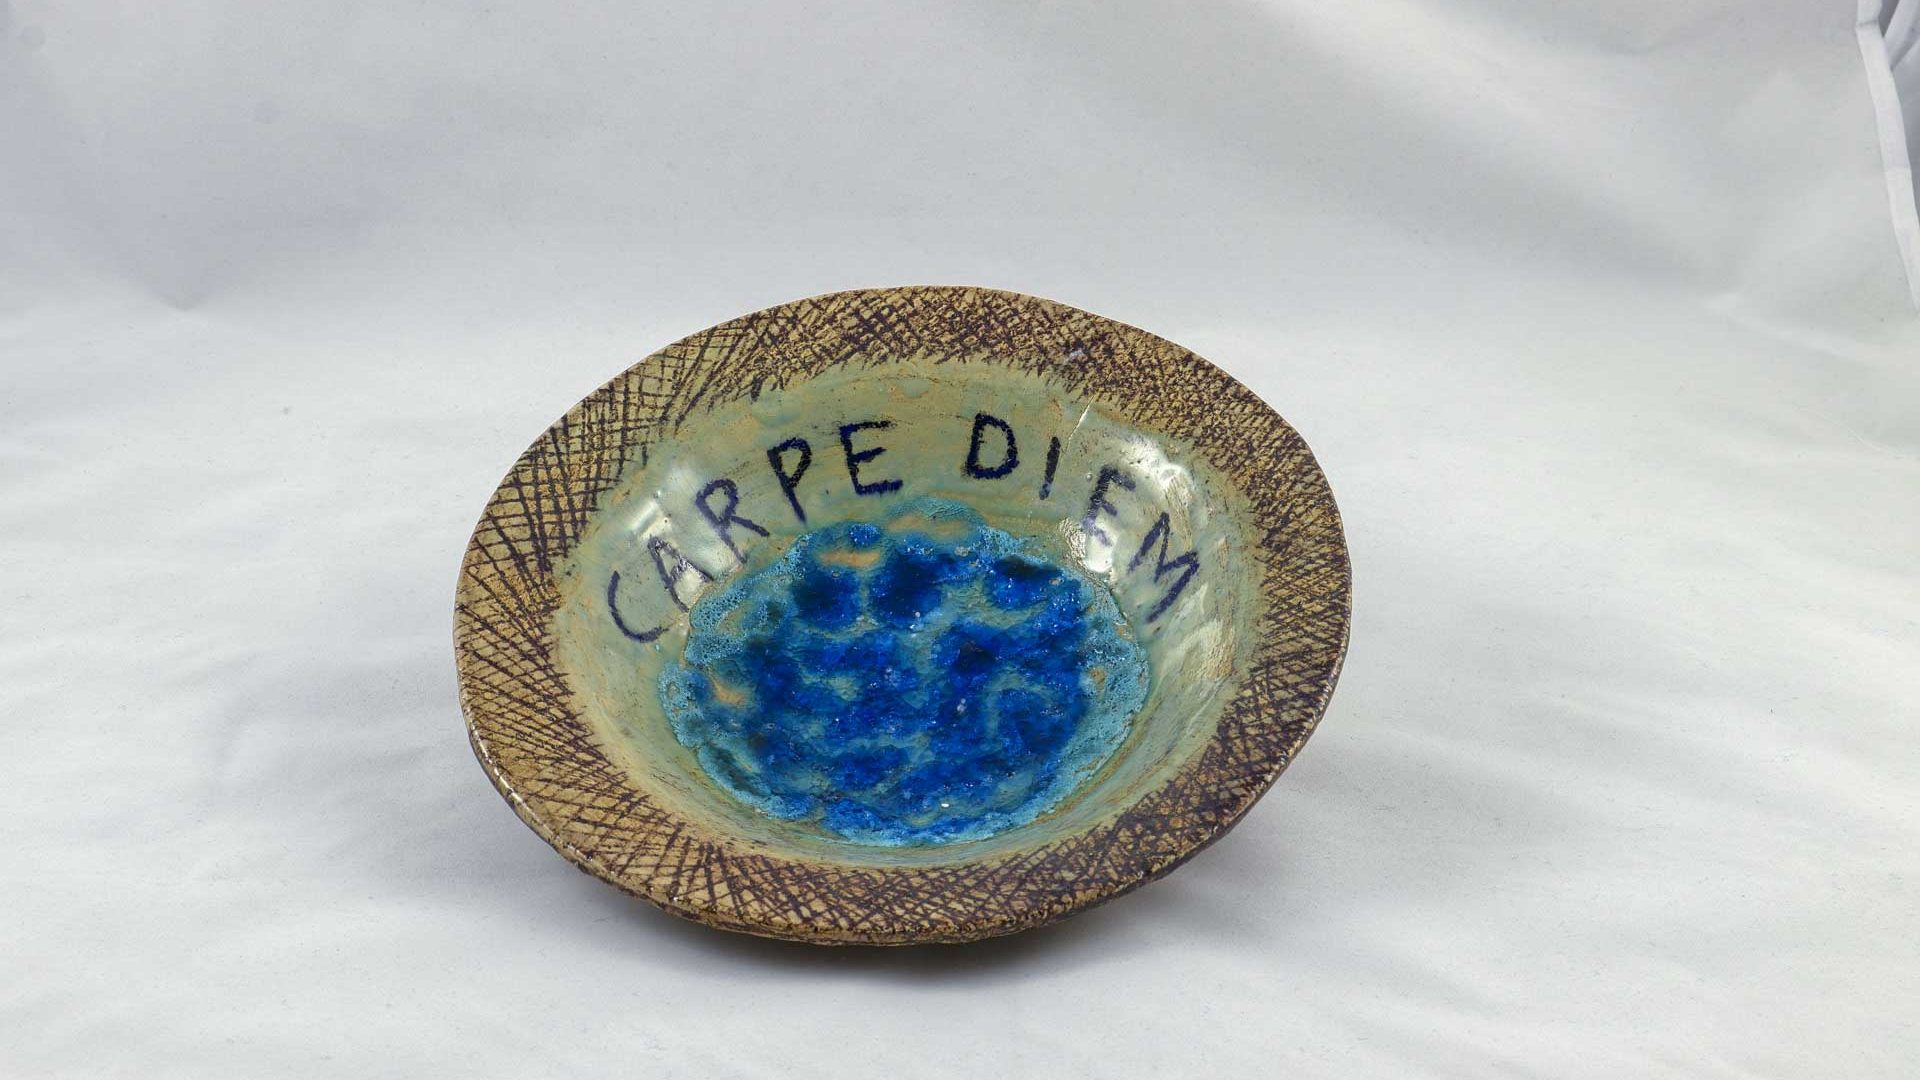 Petra Zobl Keramik - Schale Carpe Diem Manganspinell transparent geschmolzenes 1 Glas